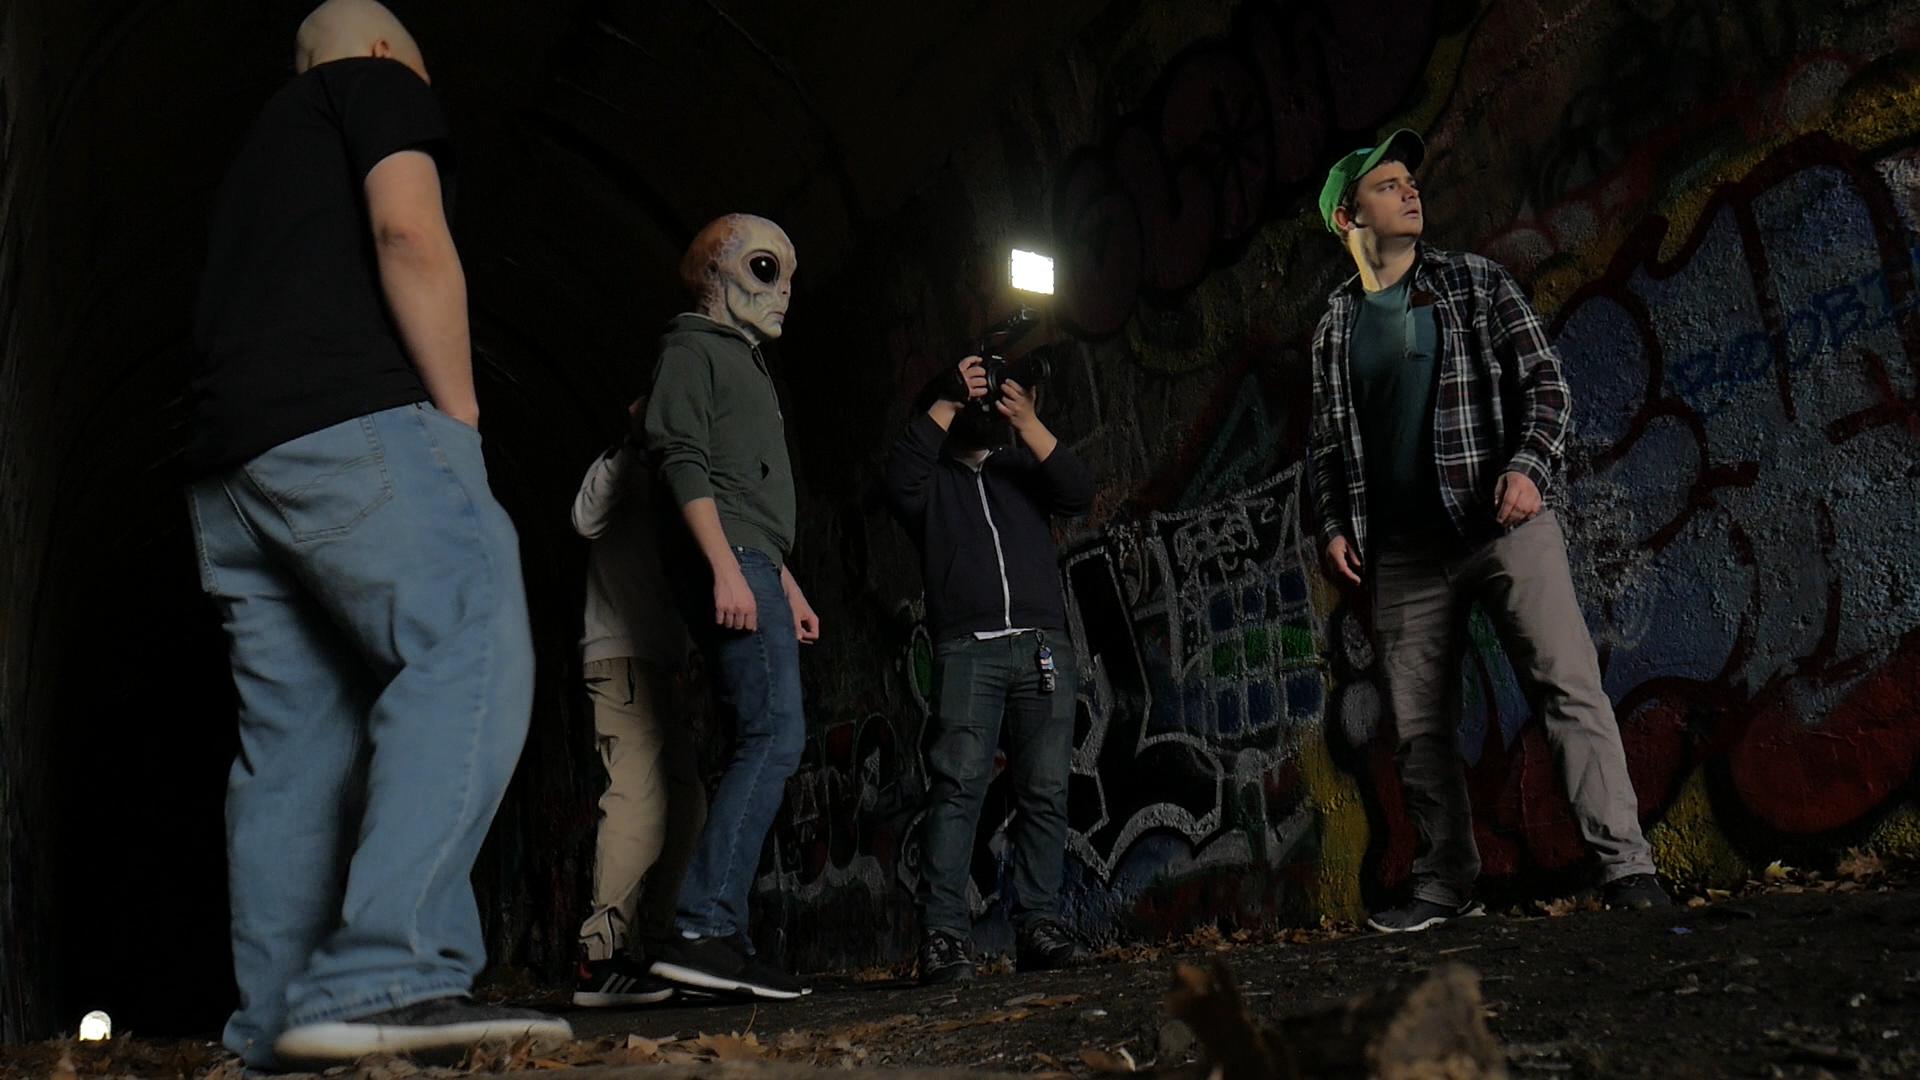 clark alumni film video scene with people in alien masks